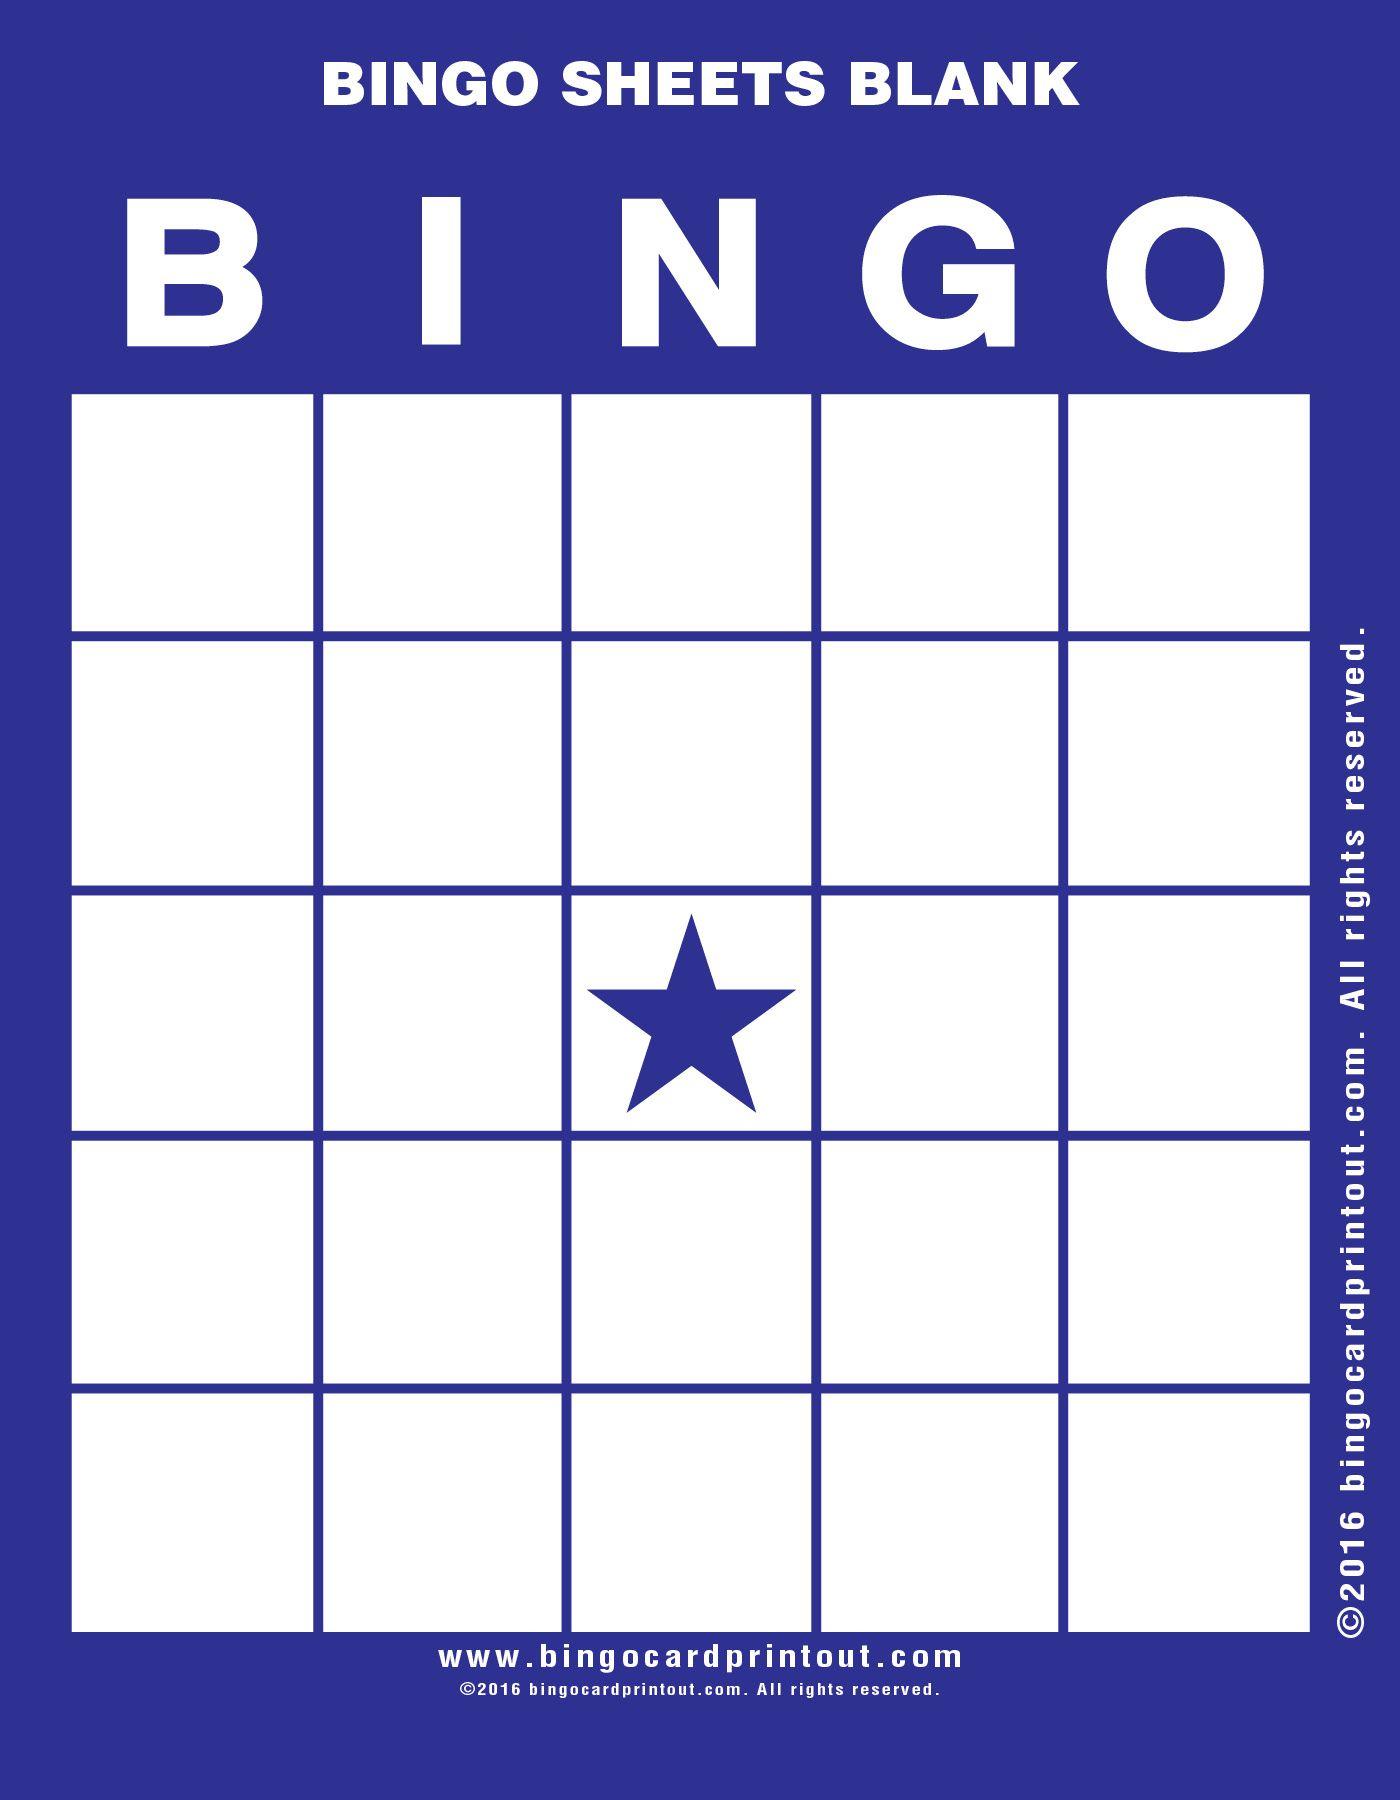 Bingo Sheets Blank 6 | Bingo Cards Printable, Bingo Card